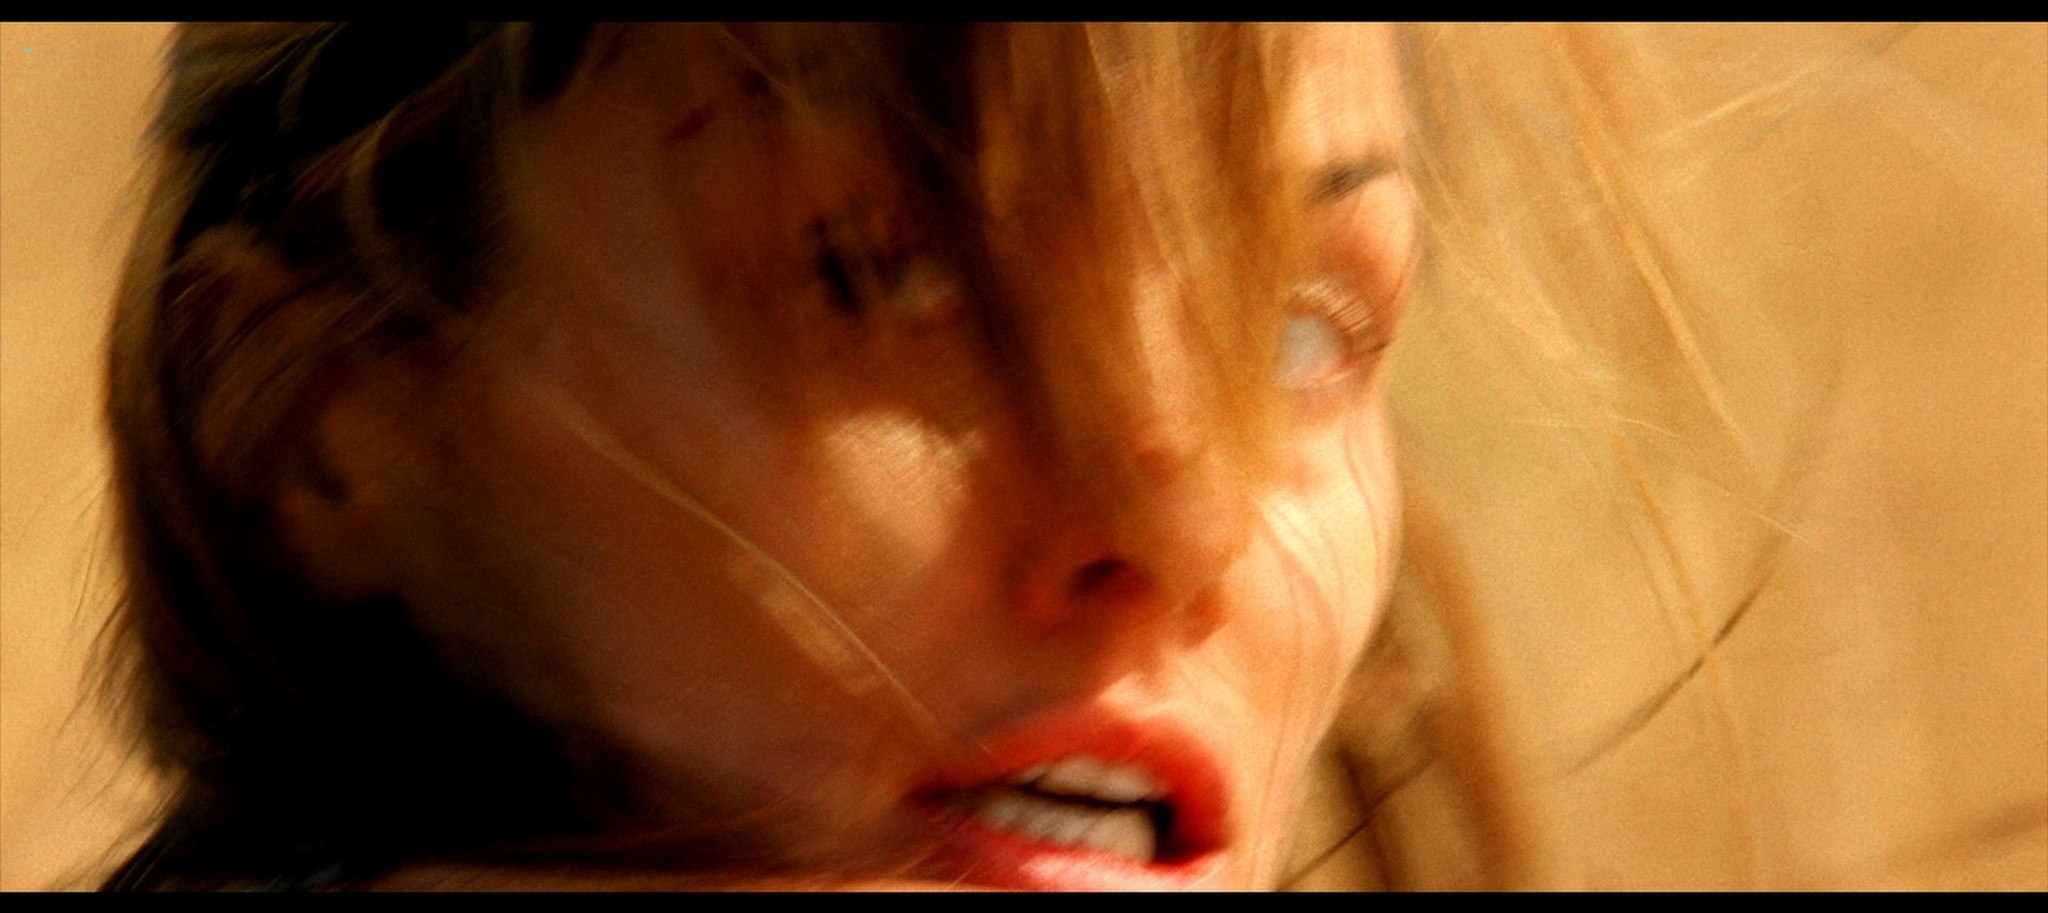 Bridget Moynahan hot and sexy Prey 2007 1080p BluRay REMUX 8